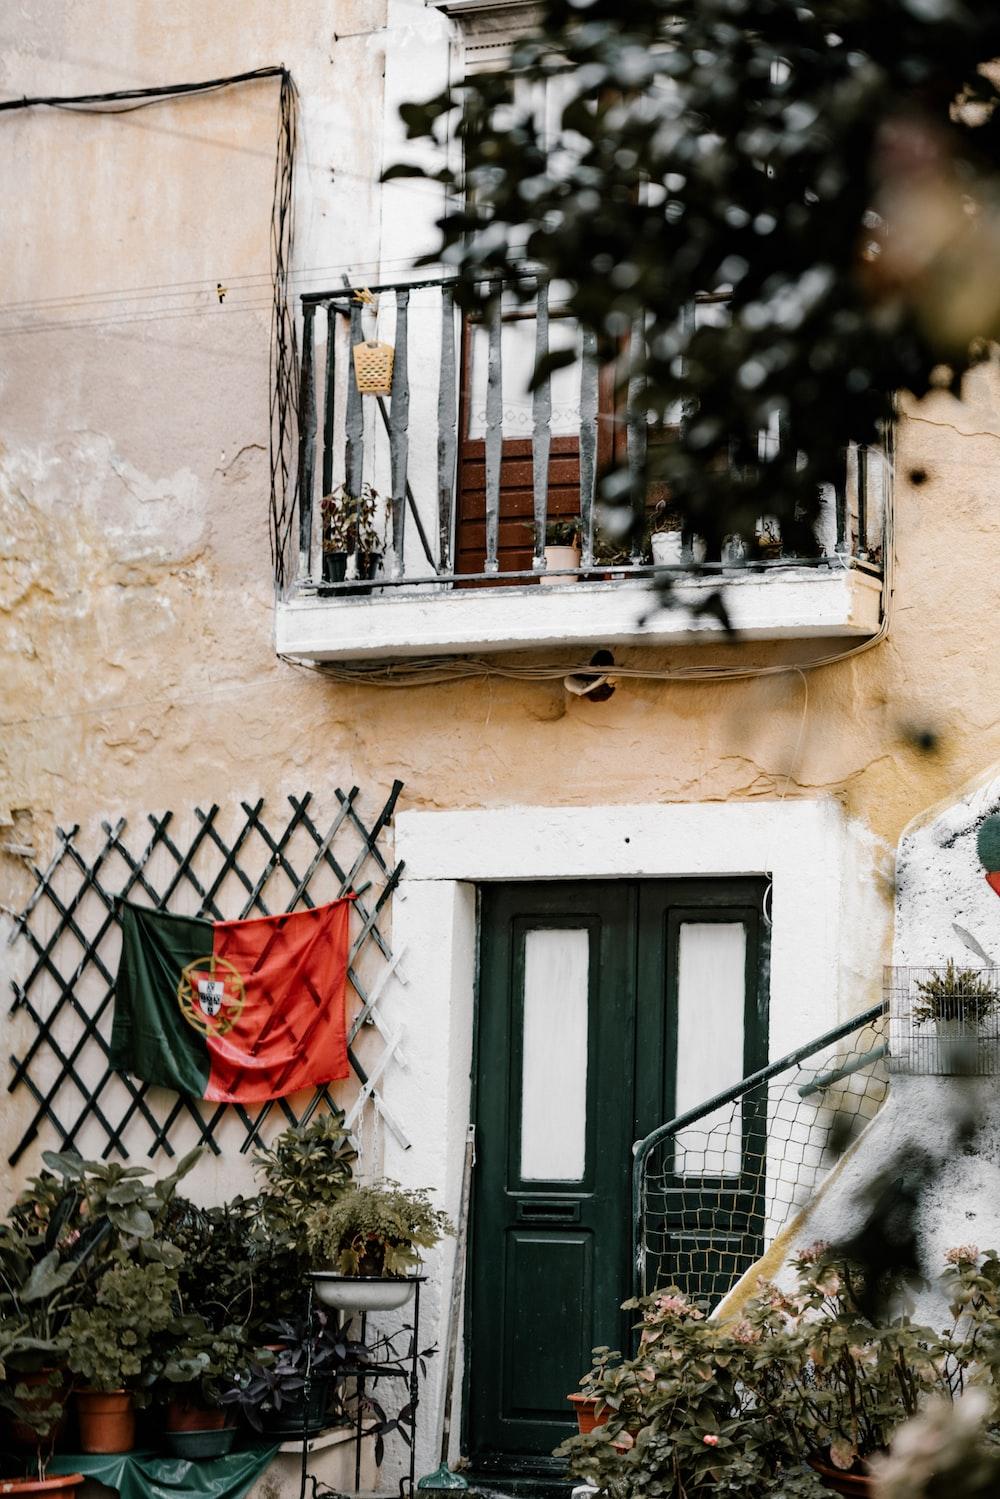 Portugal flag hung near door